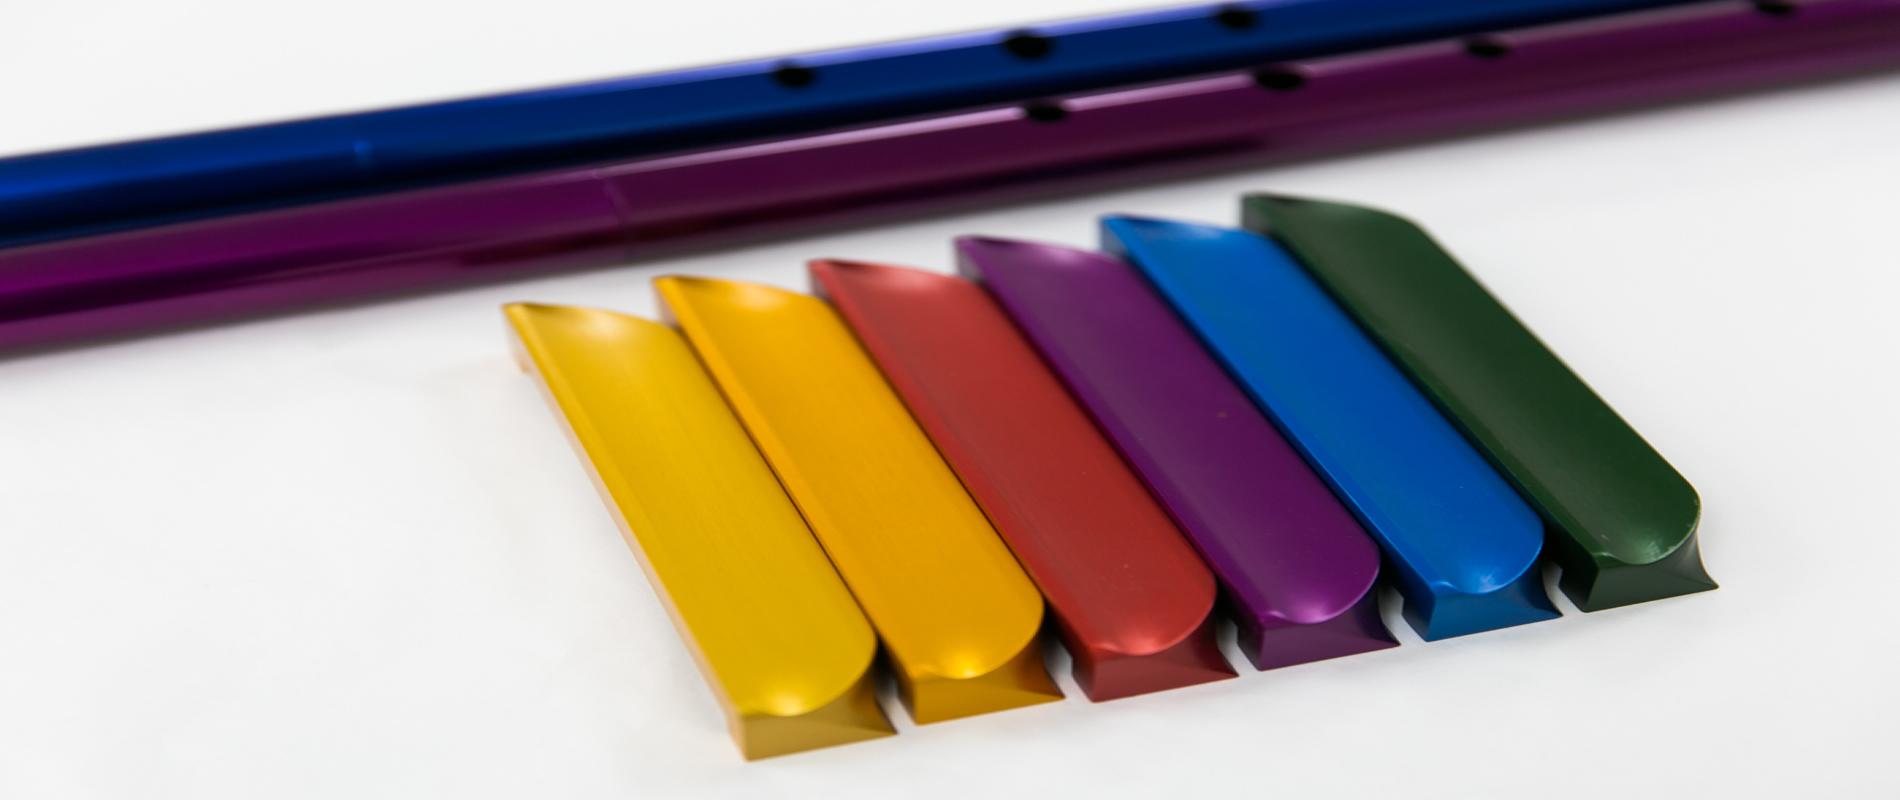 Colours-MK-Specac-1.jpg